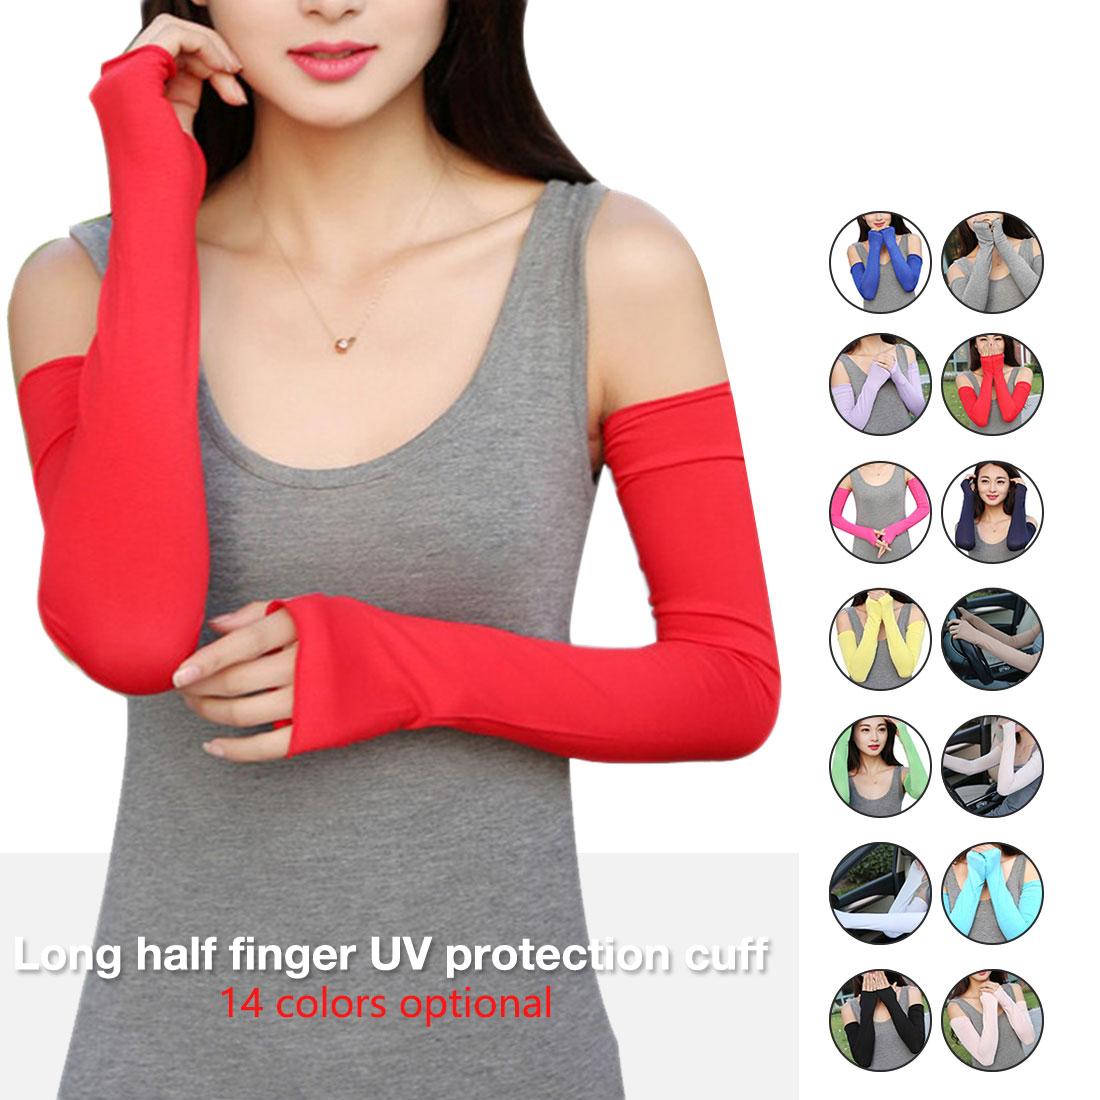 Man Women Long Gloves Sun UV Protection Hand Protector Cover Arm Sleeves Ice Silk Sunscreen Sleeves Elbow Arm Sleeves Arm Cover